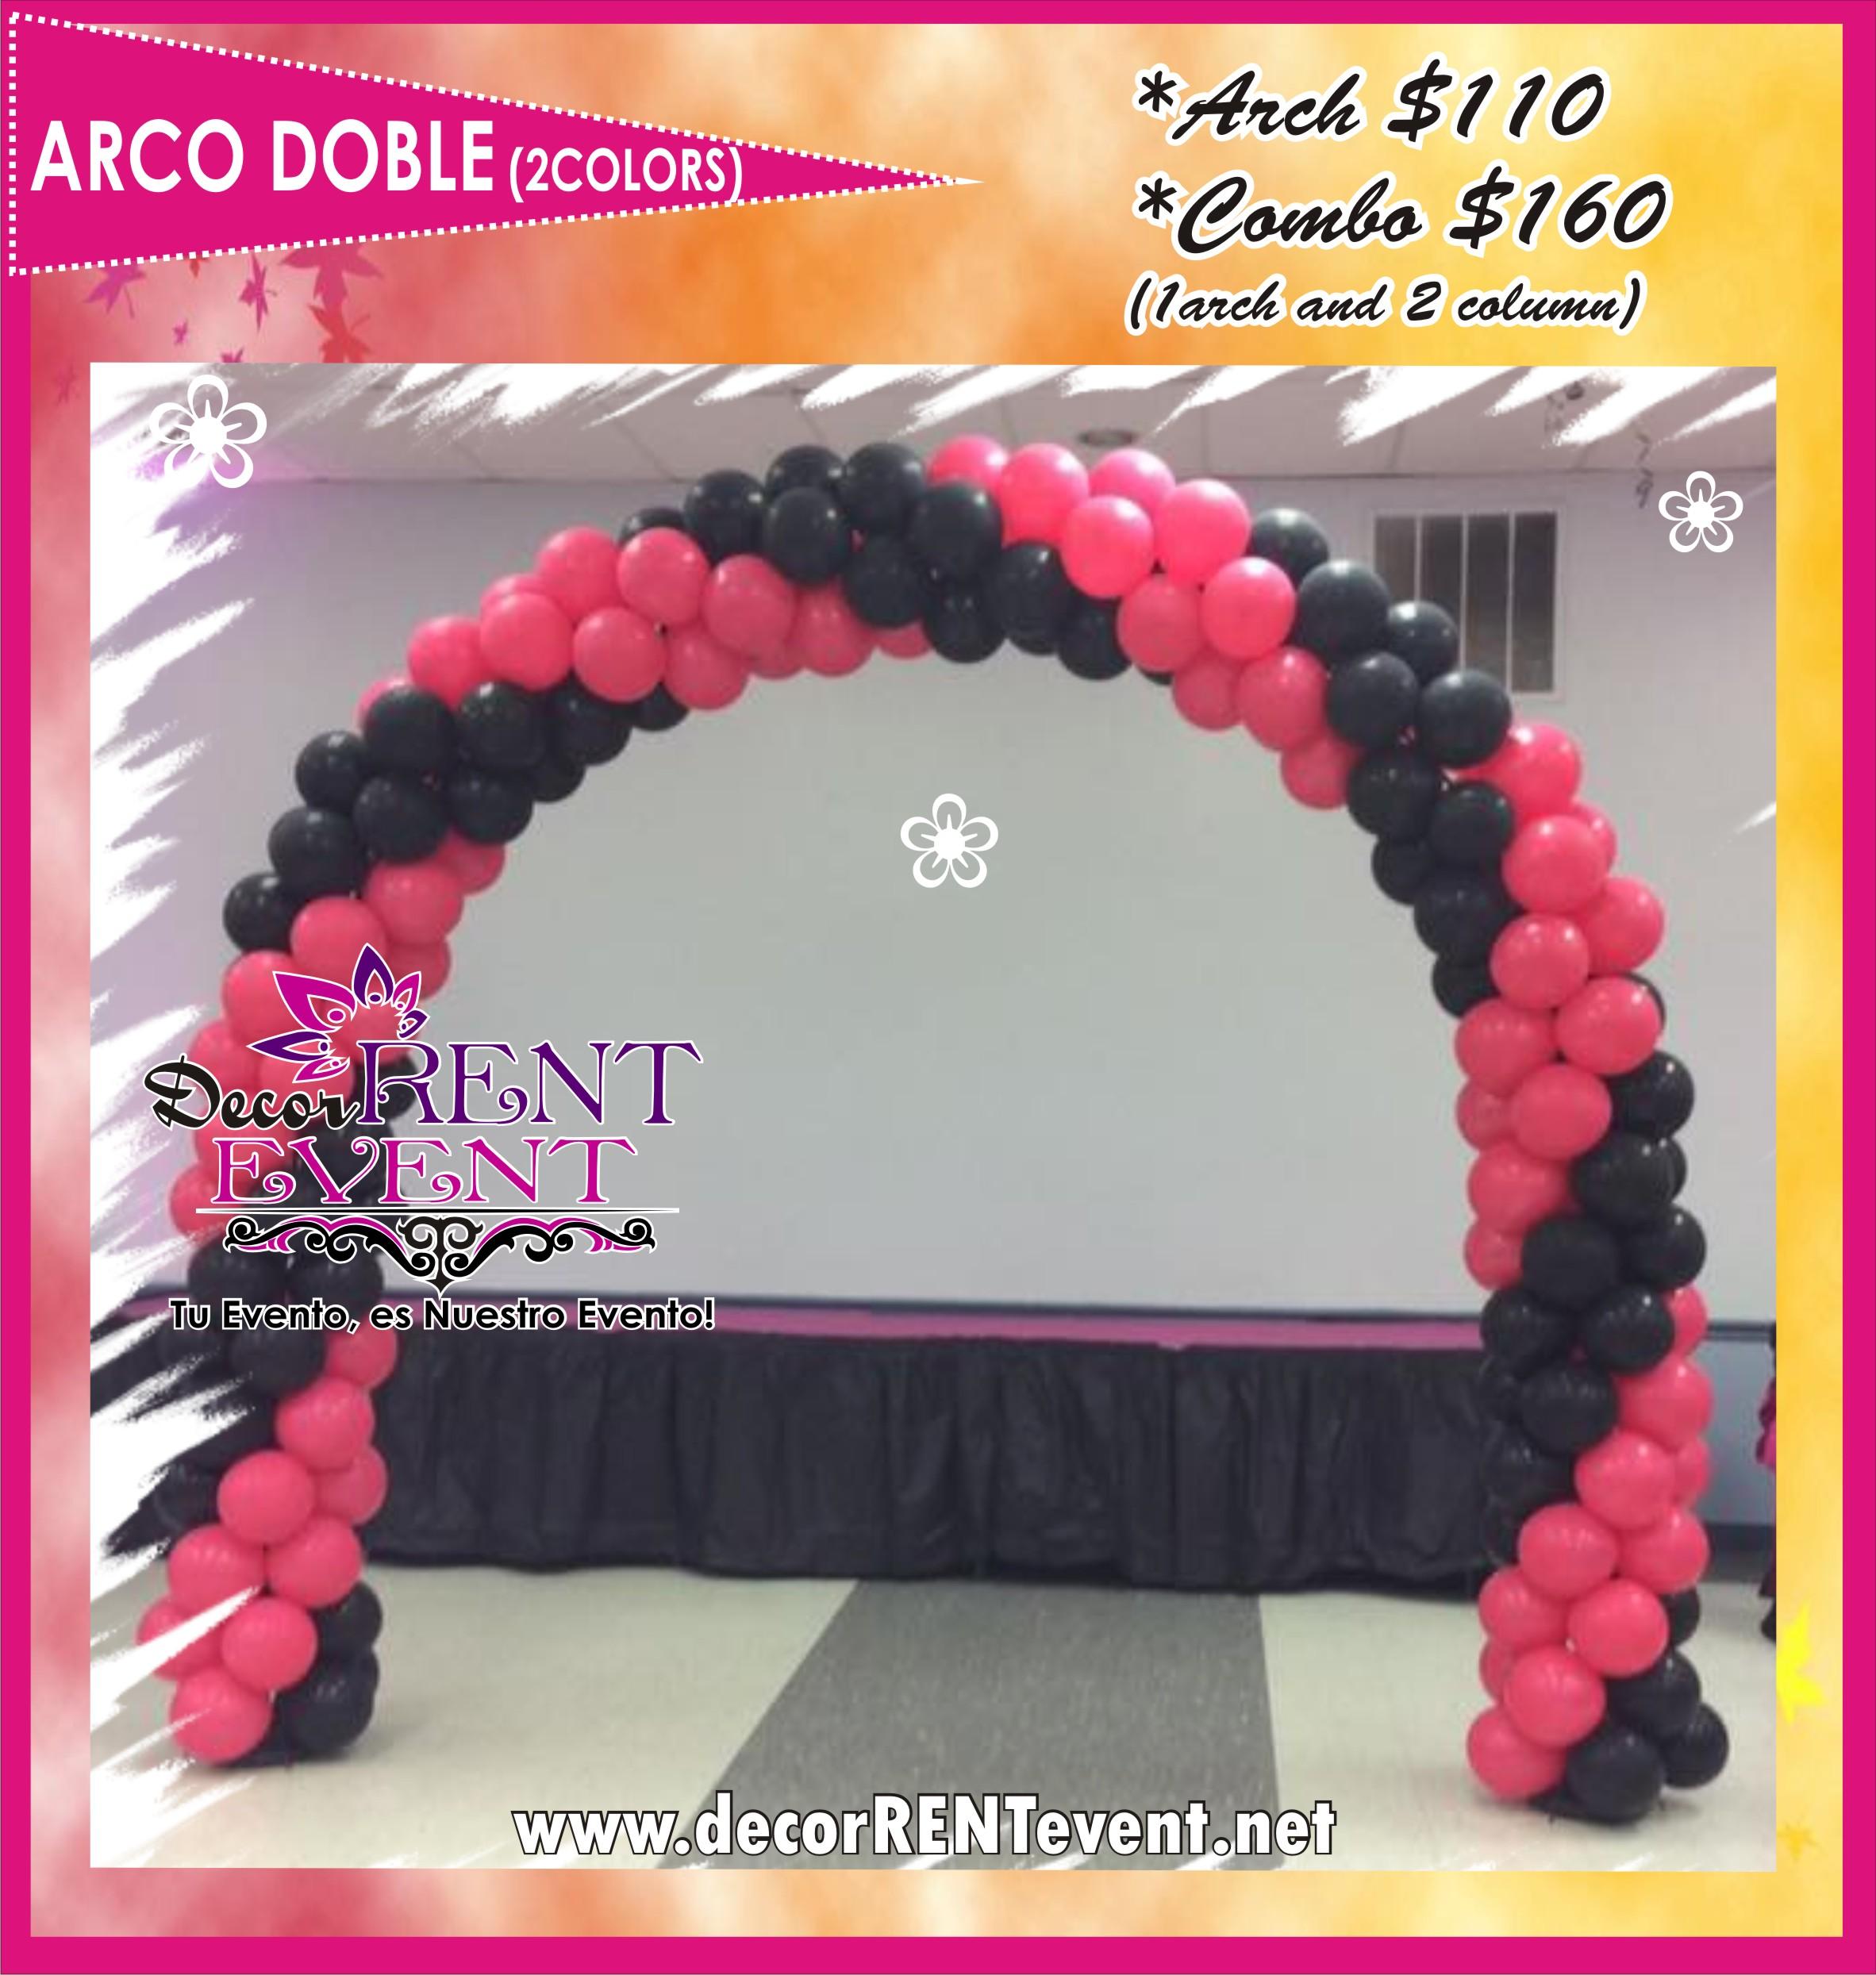 arch #1